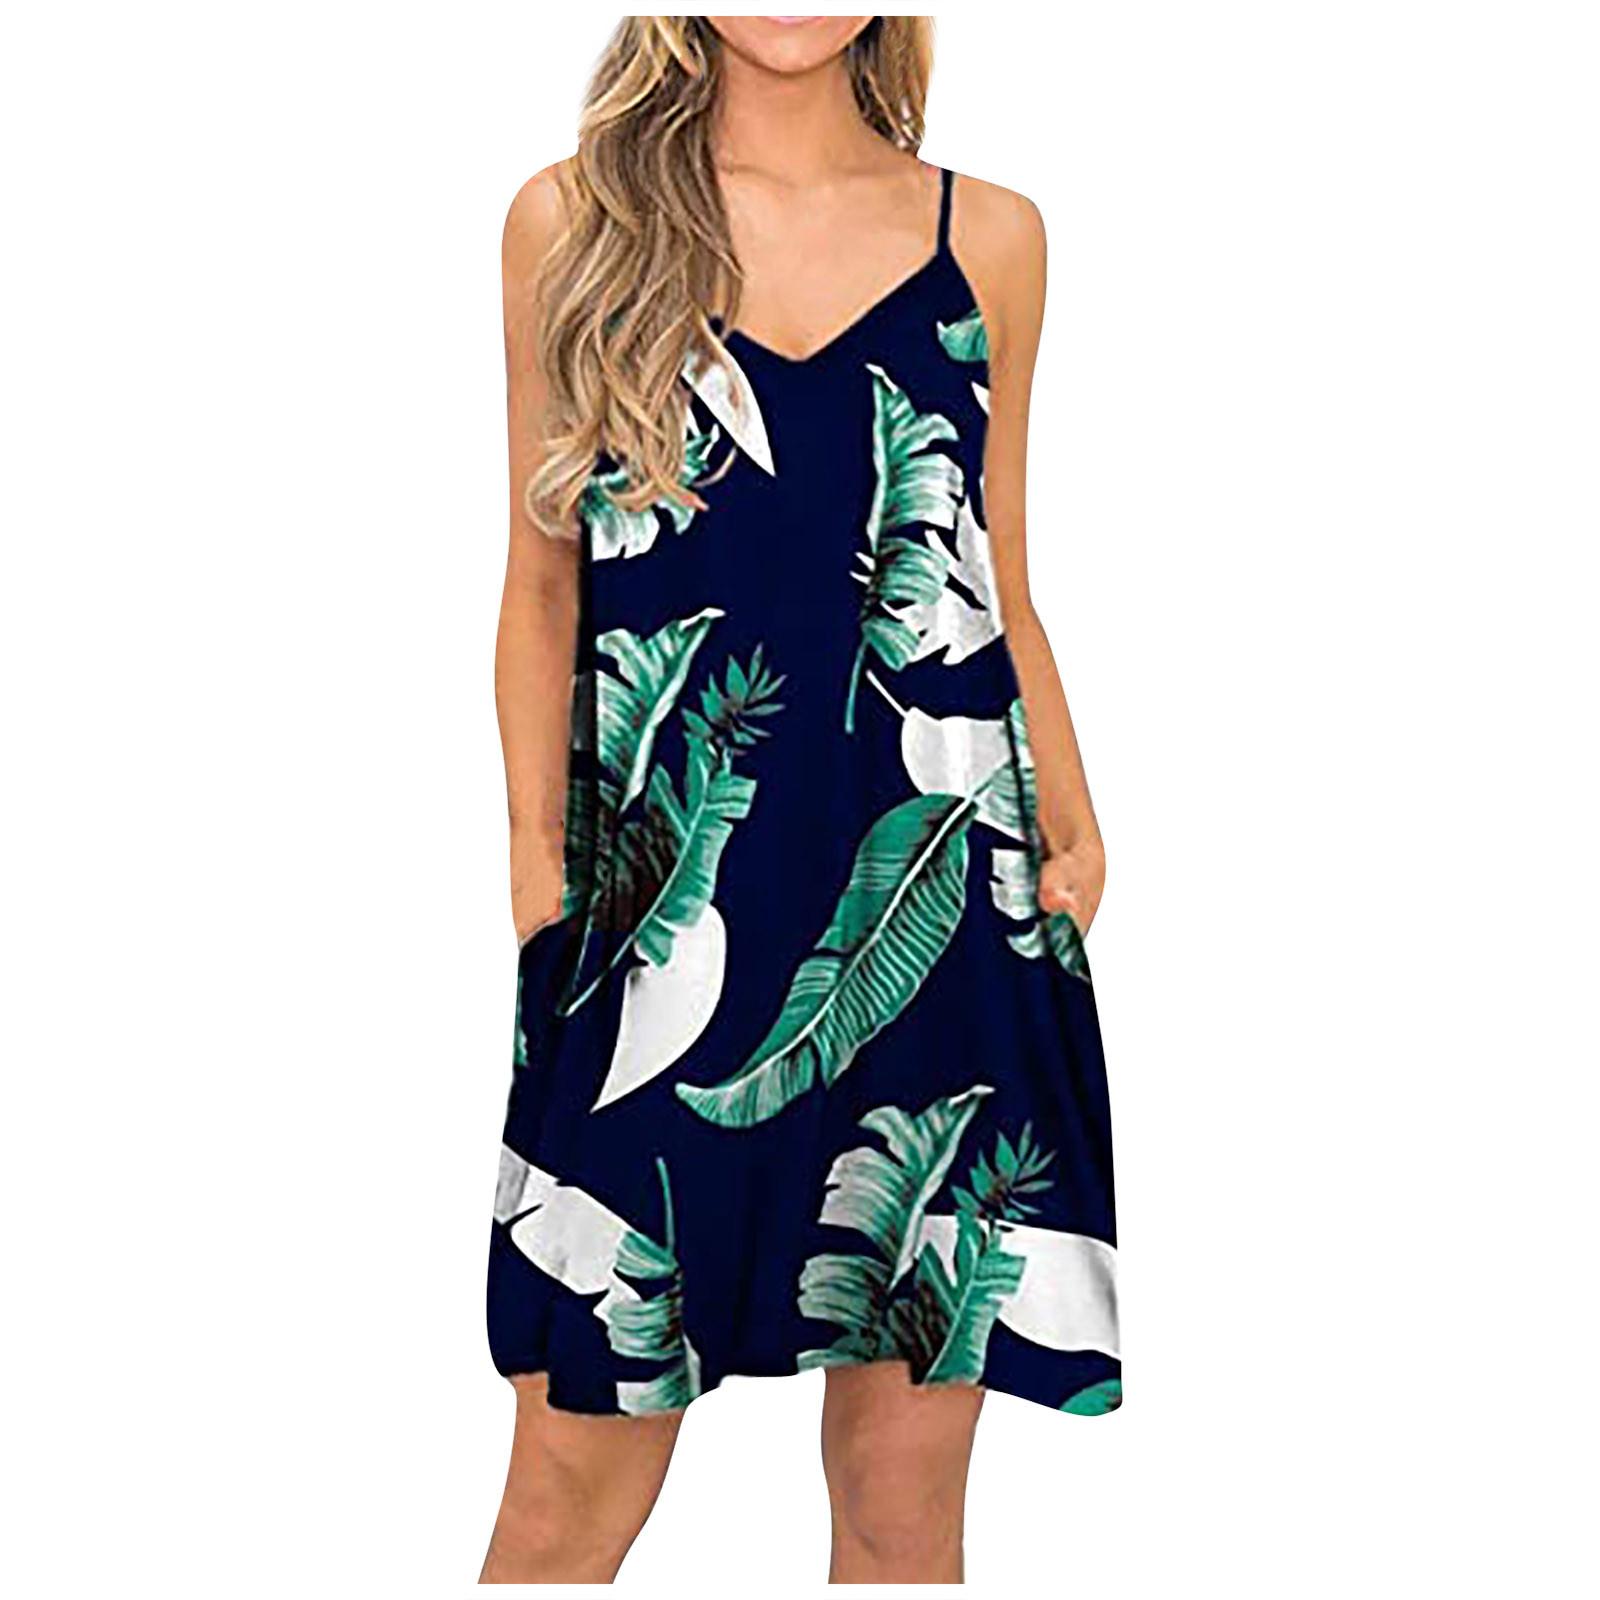 F# Summer Spaghetti Strap Dress Summer Casual Beach Cover Up Plain Pleated Tank Slip Mini Dresses Floral Printed Dresses Robe